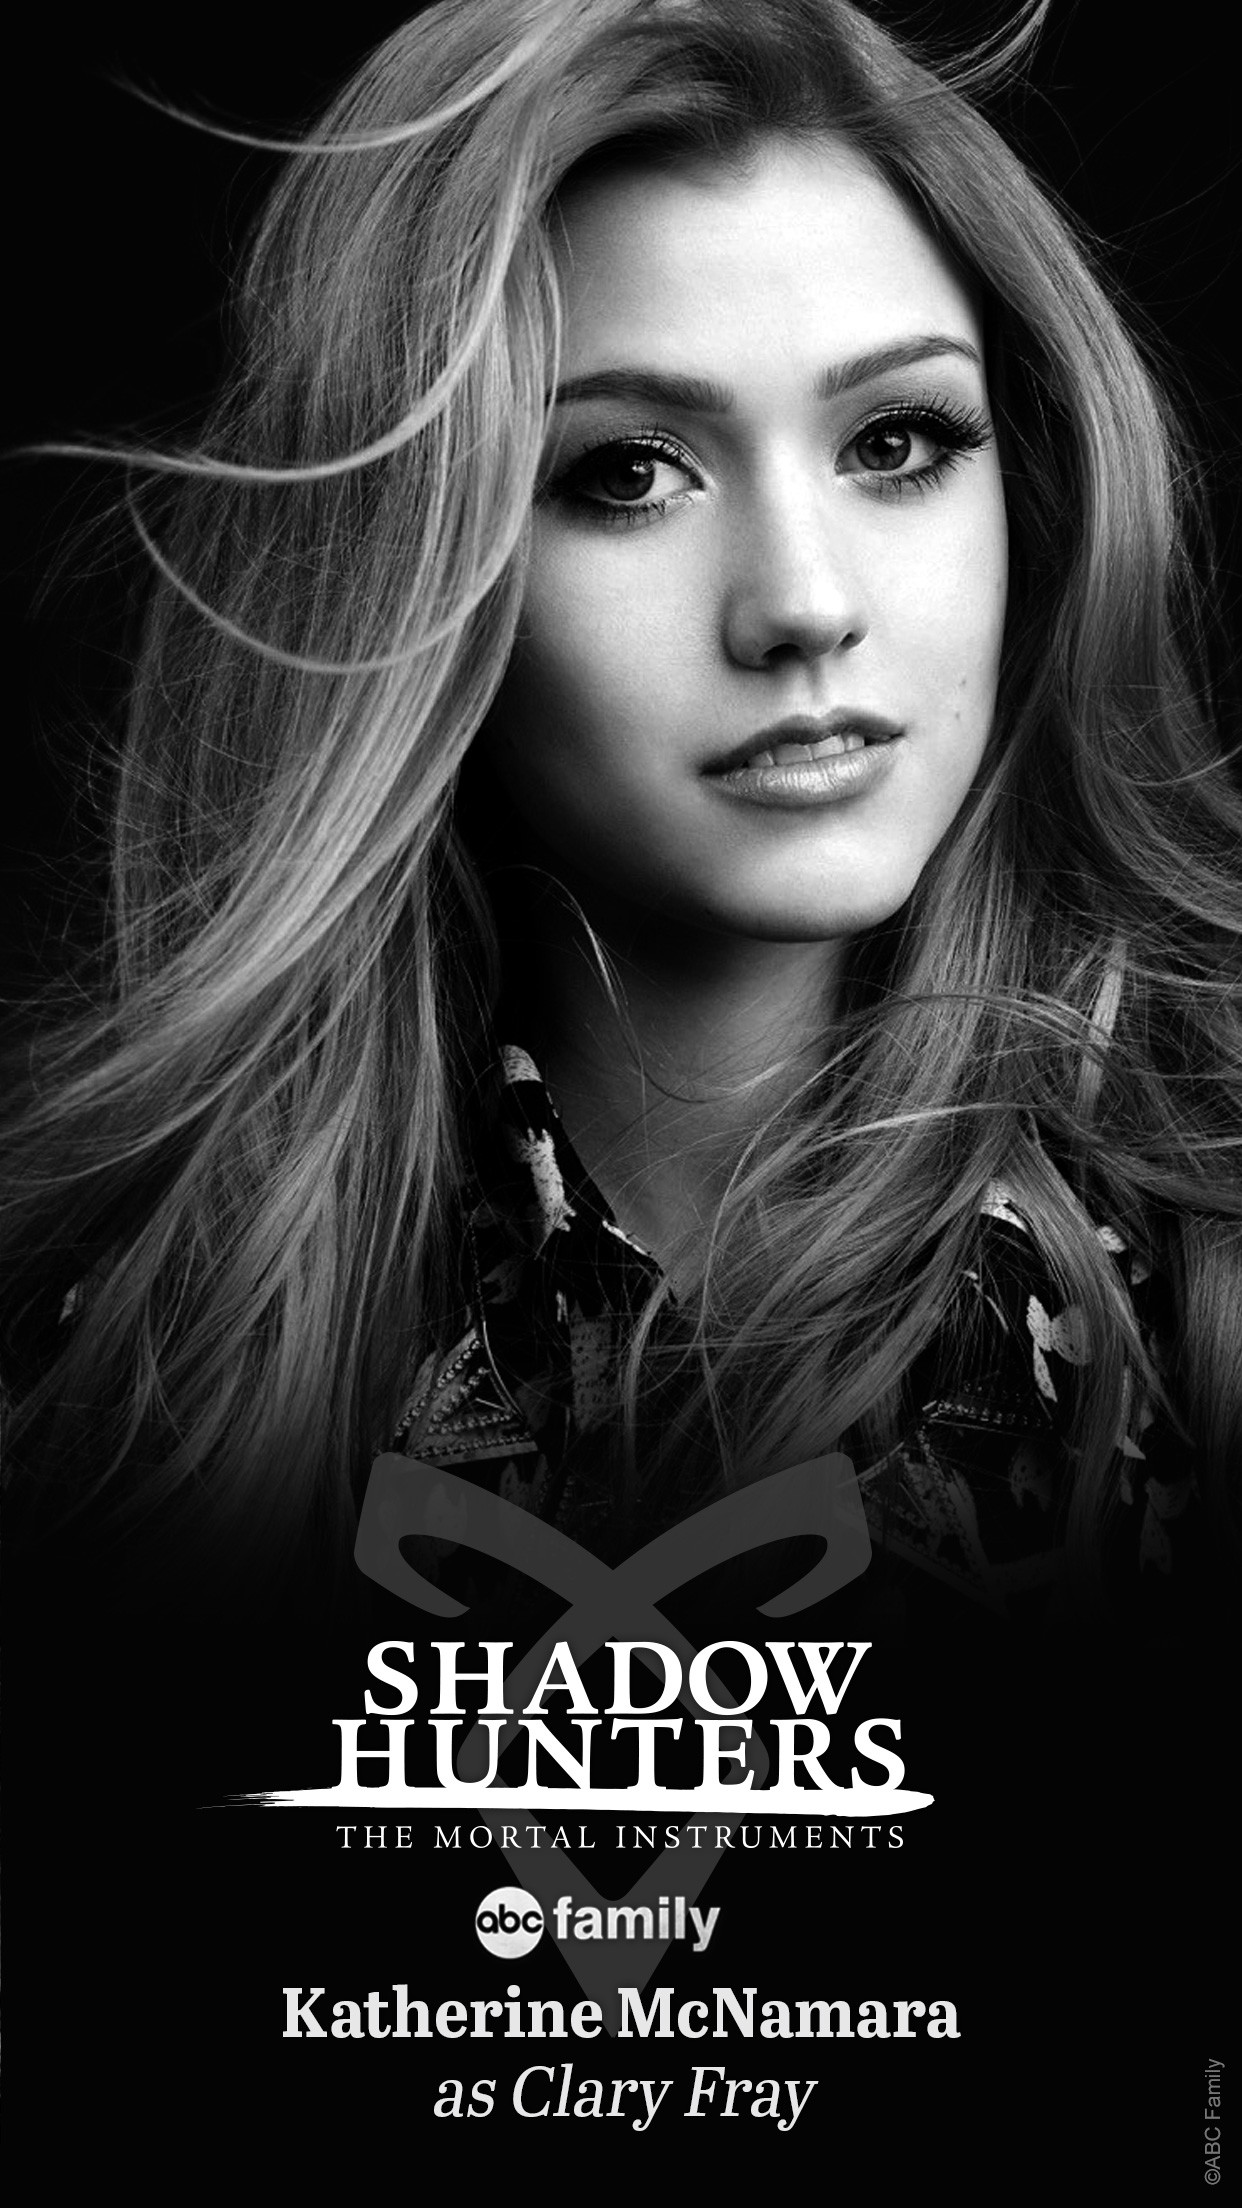 Shadowhunters …